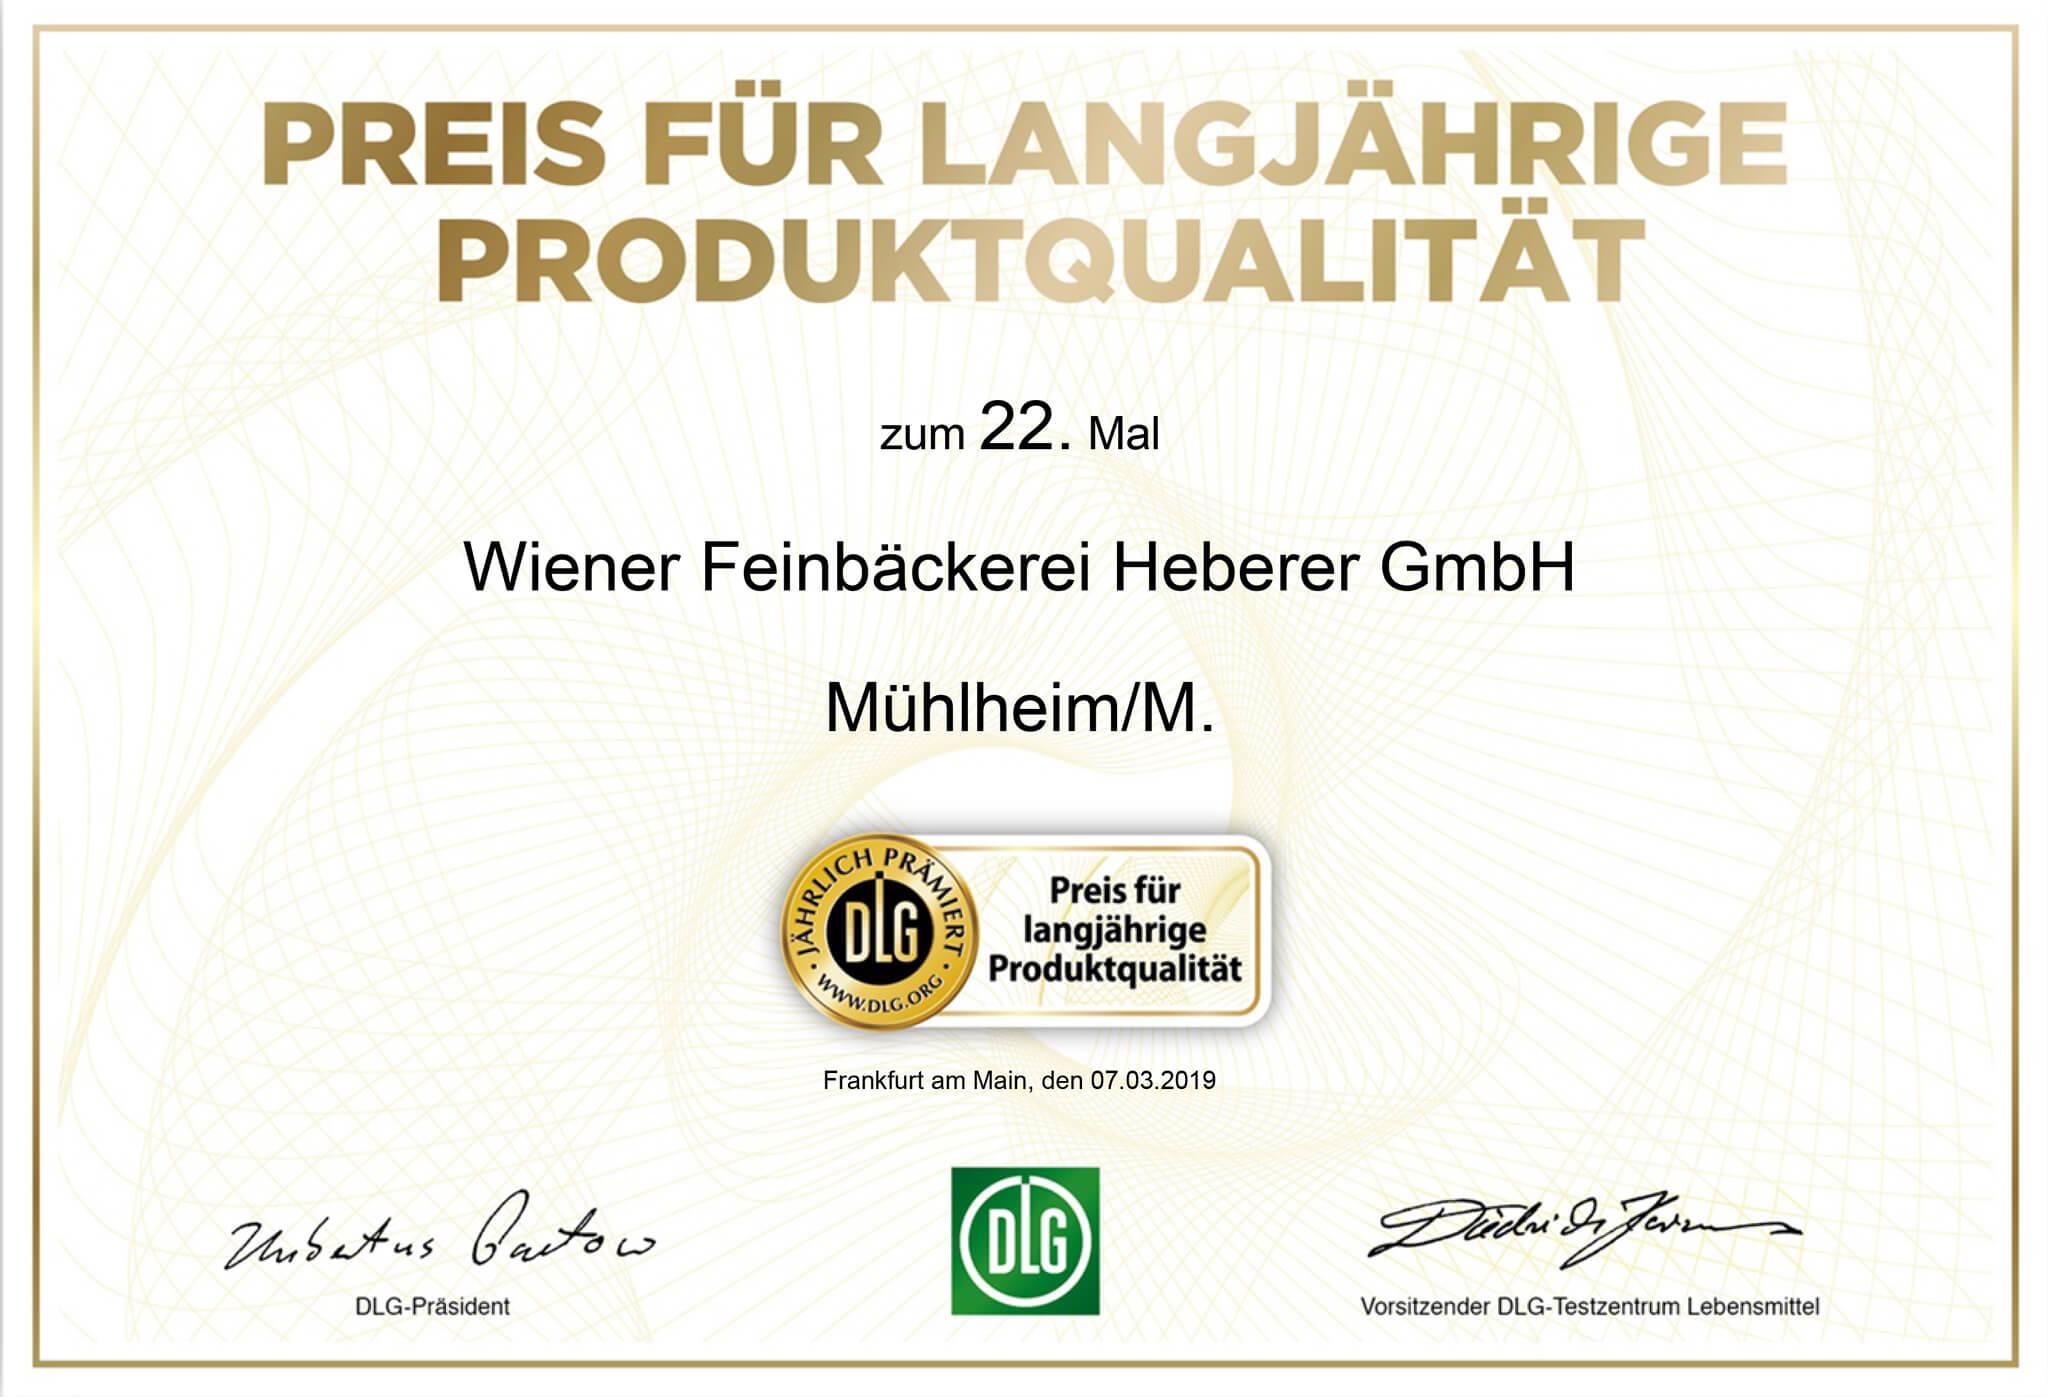 DLG Zertifikat fuer langjaehrige Produktqualitaet 2019